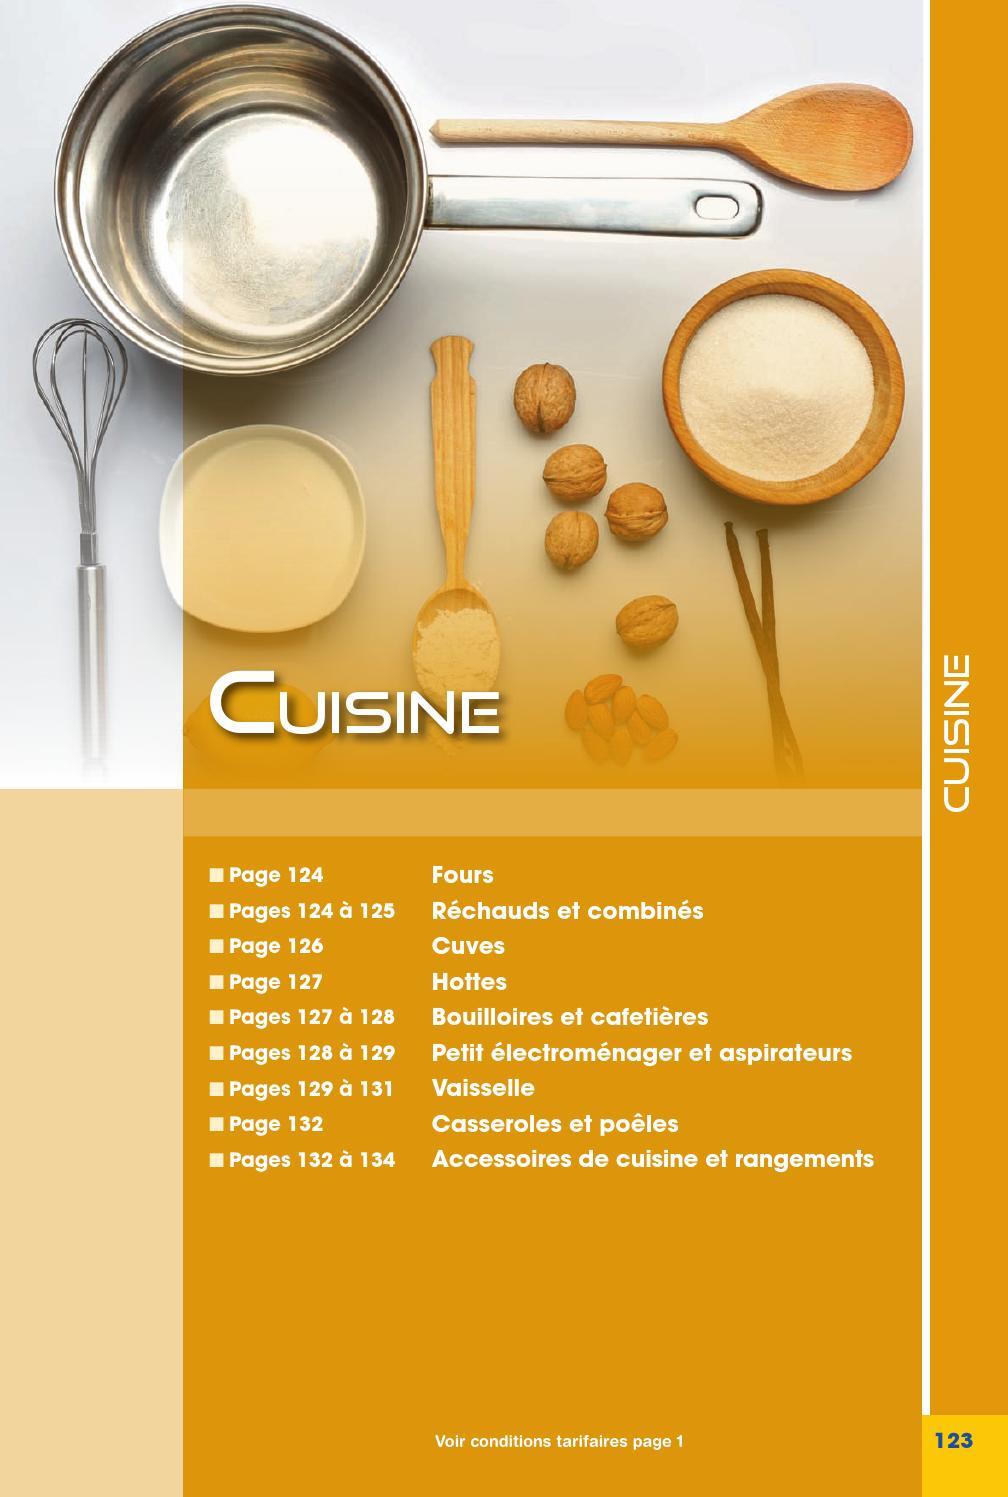 Cuisine 2016 by destin a accessoires page 1 issuu for Accessoire cuisine original